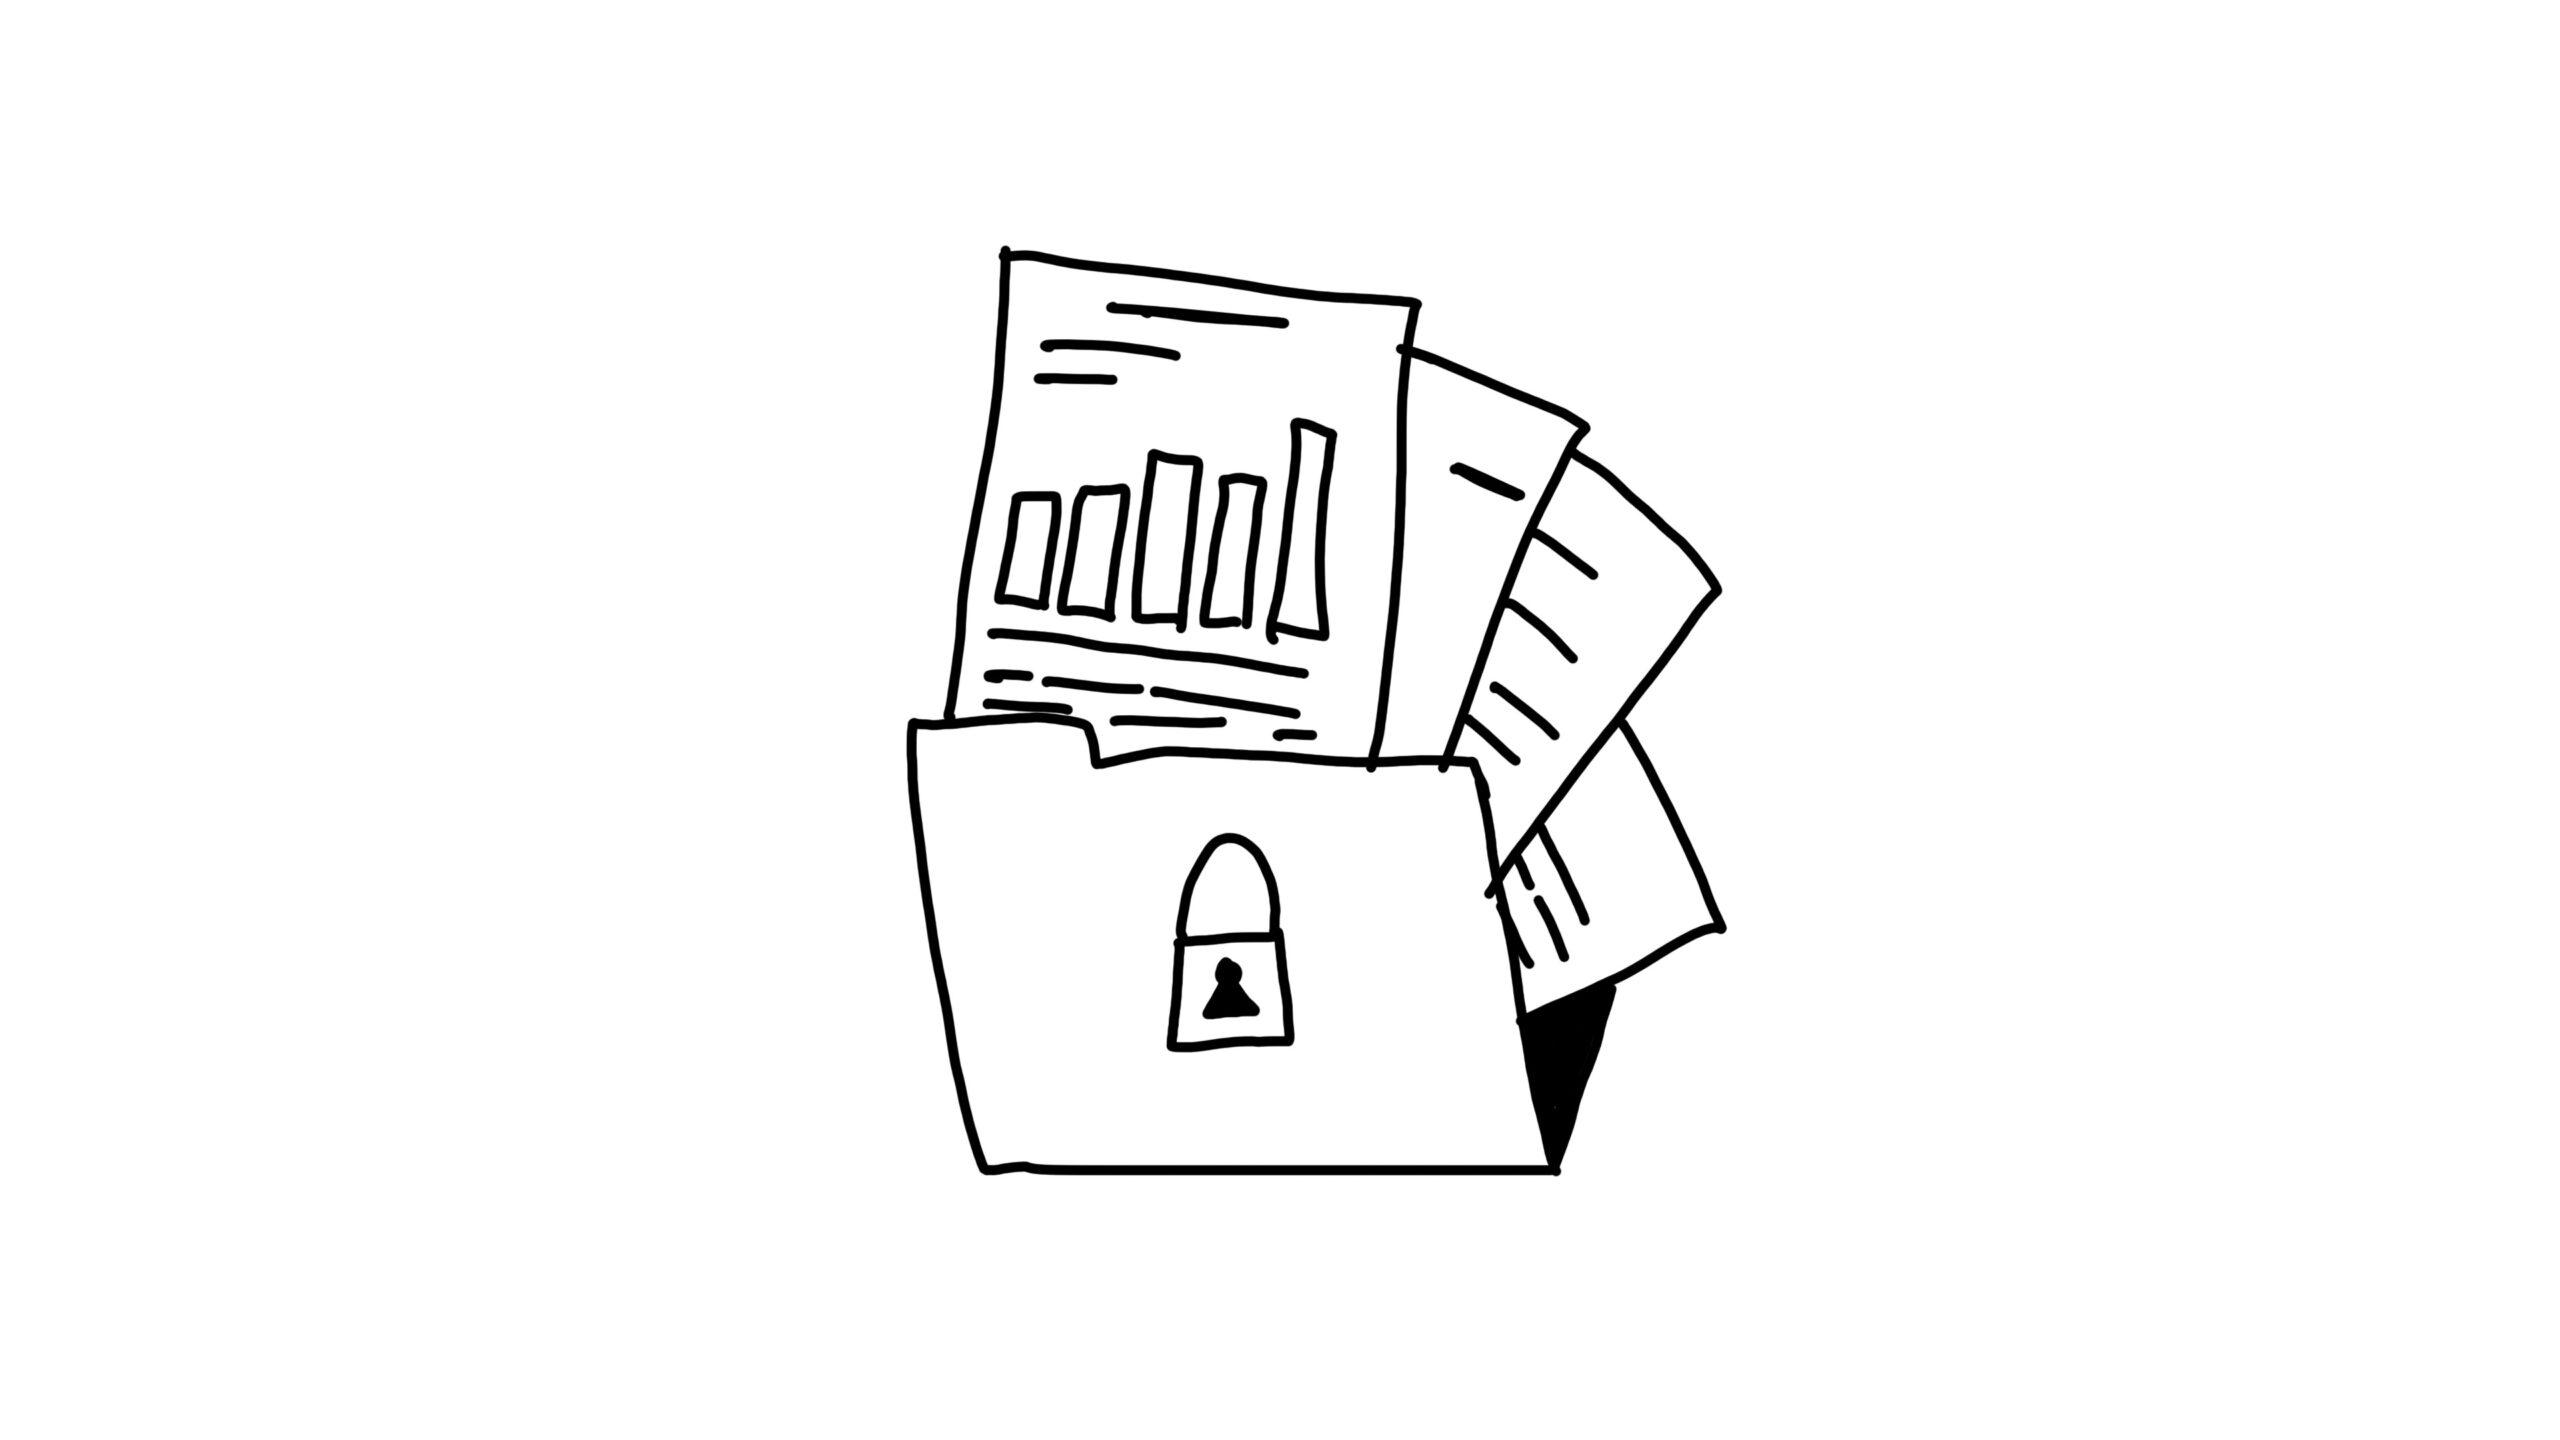 Privacy_Incident_Sketchboard_0307